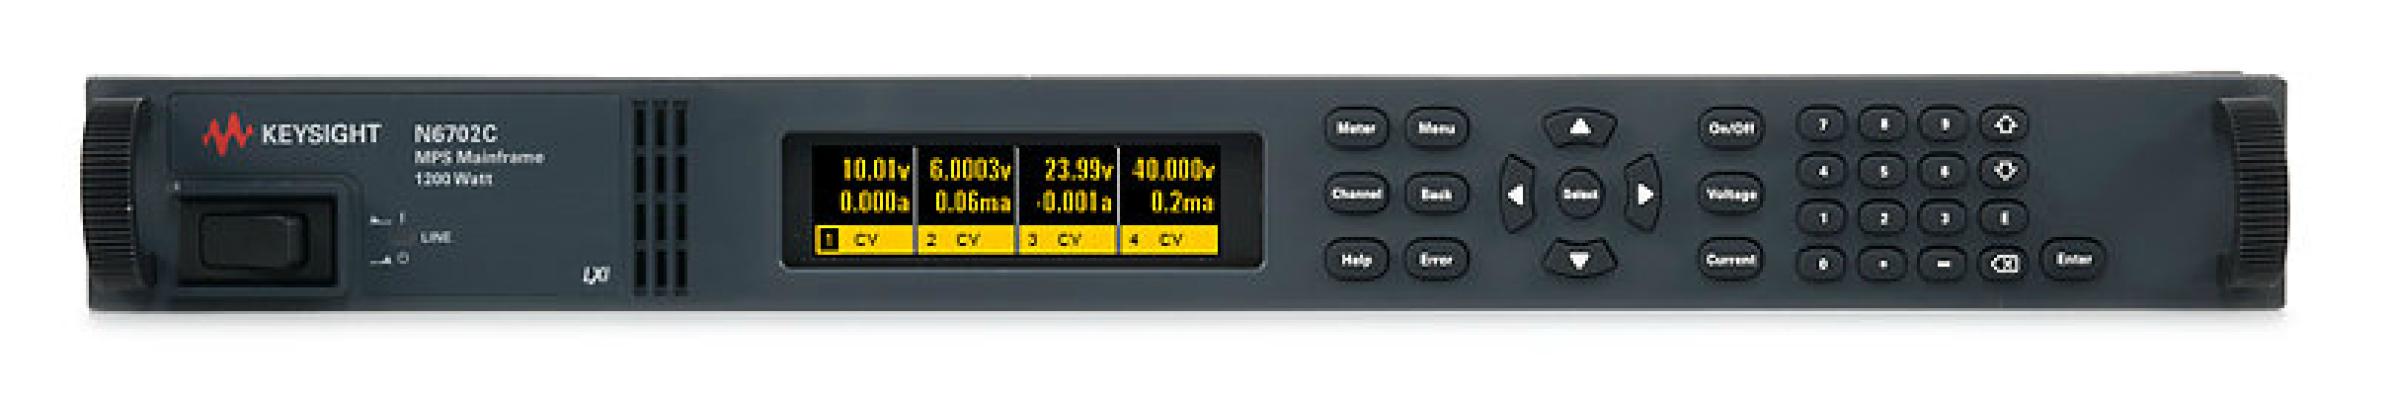 Keysight Base Model Custom Configured Modular Power System, N6710C